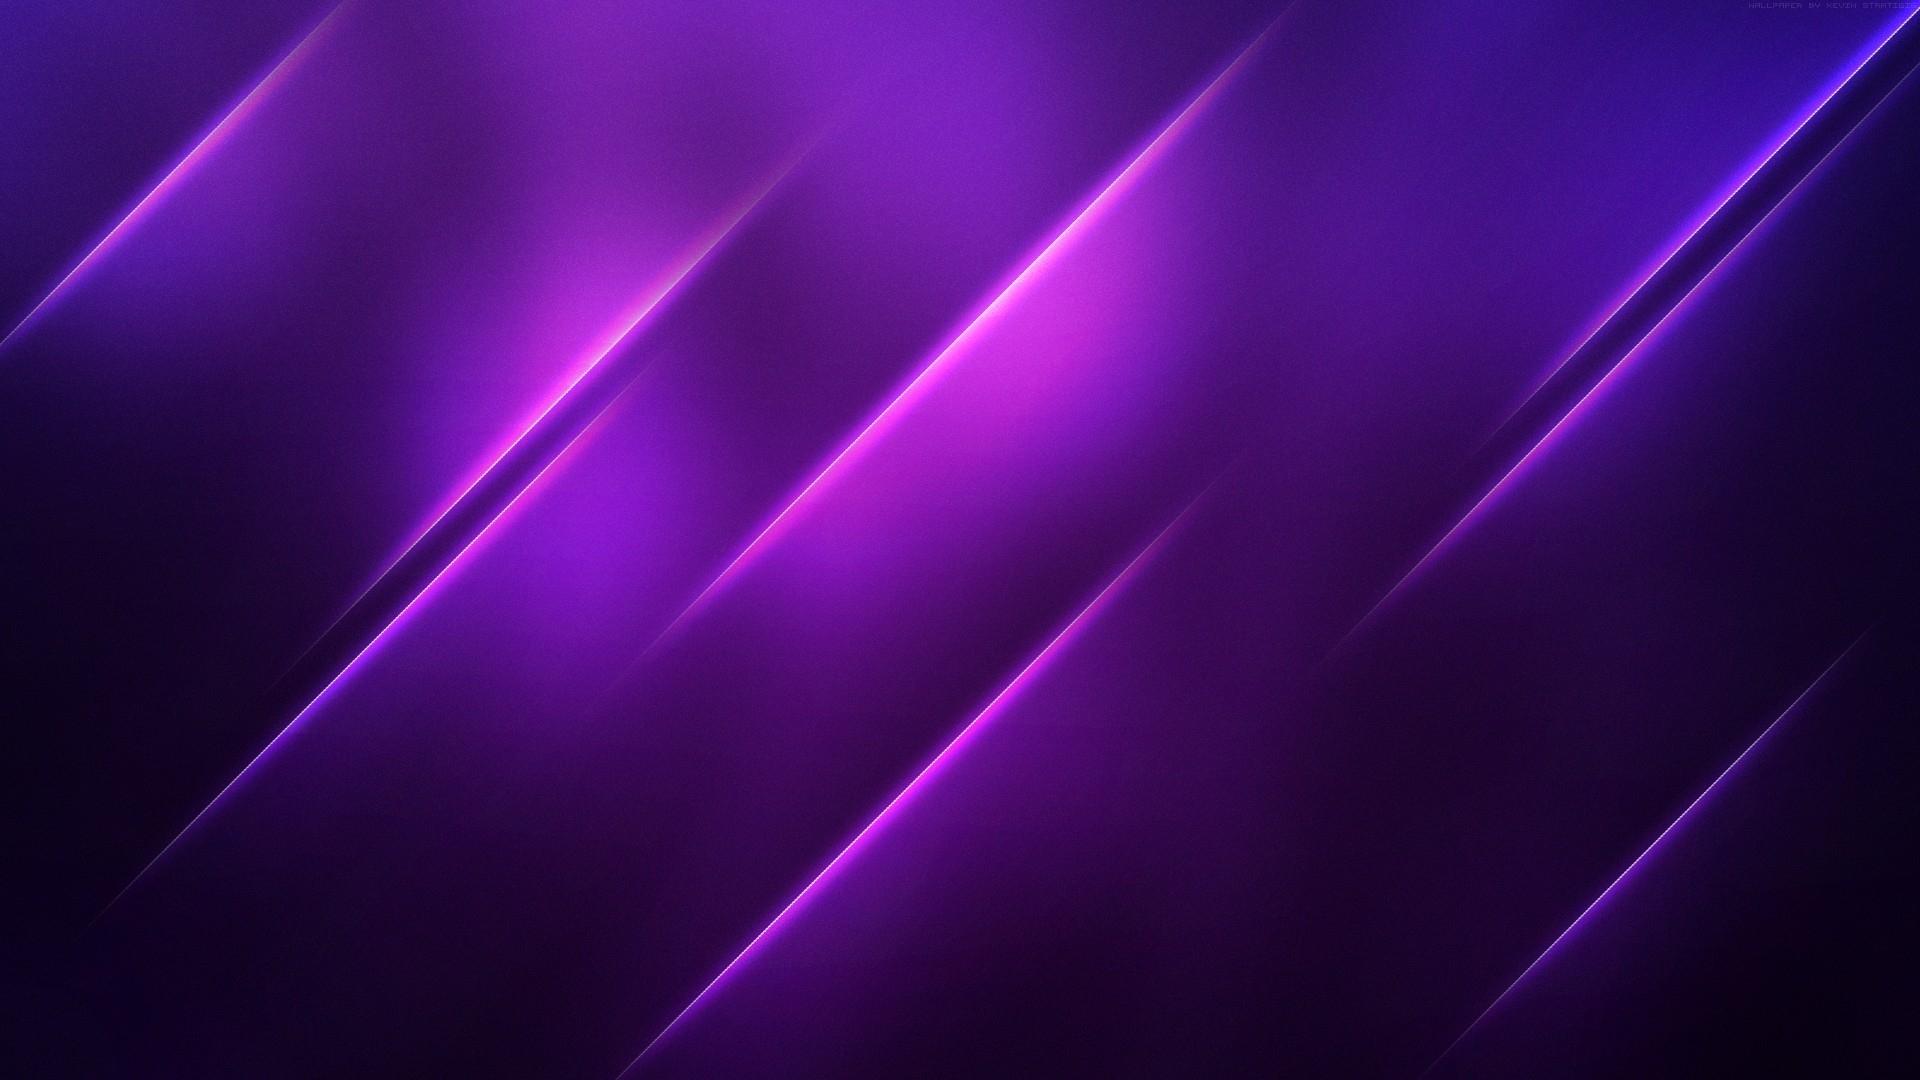 Purple Backgrounds wallpaper Solid Purple Backgrounds hd wallpaper 1920x1080